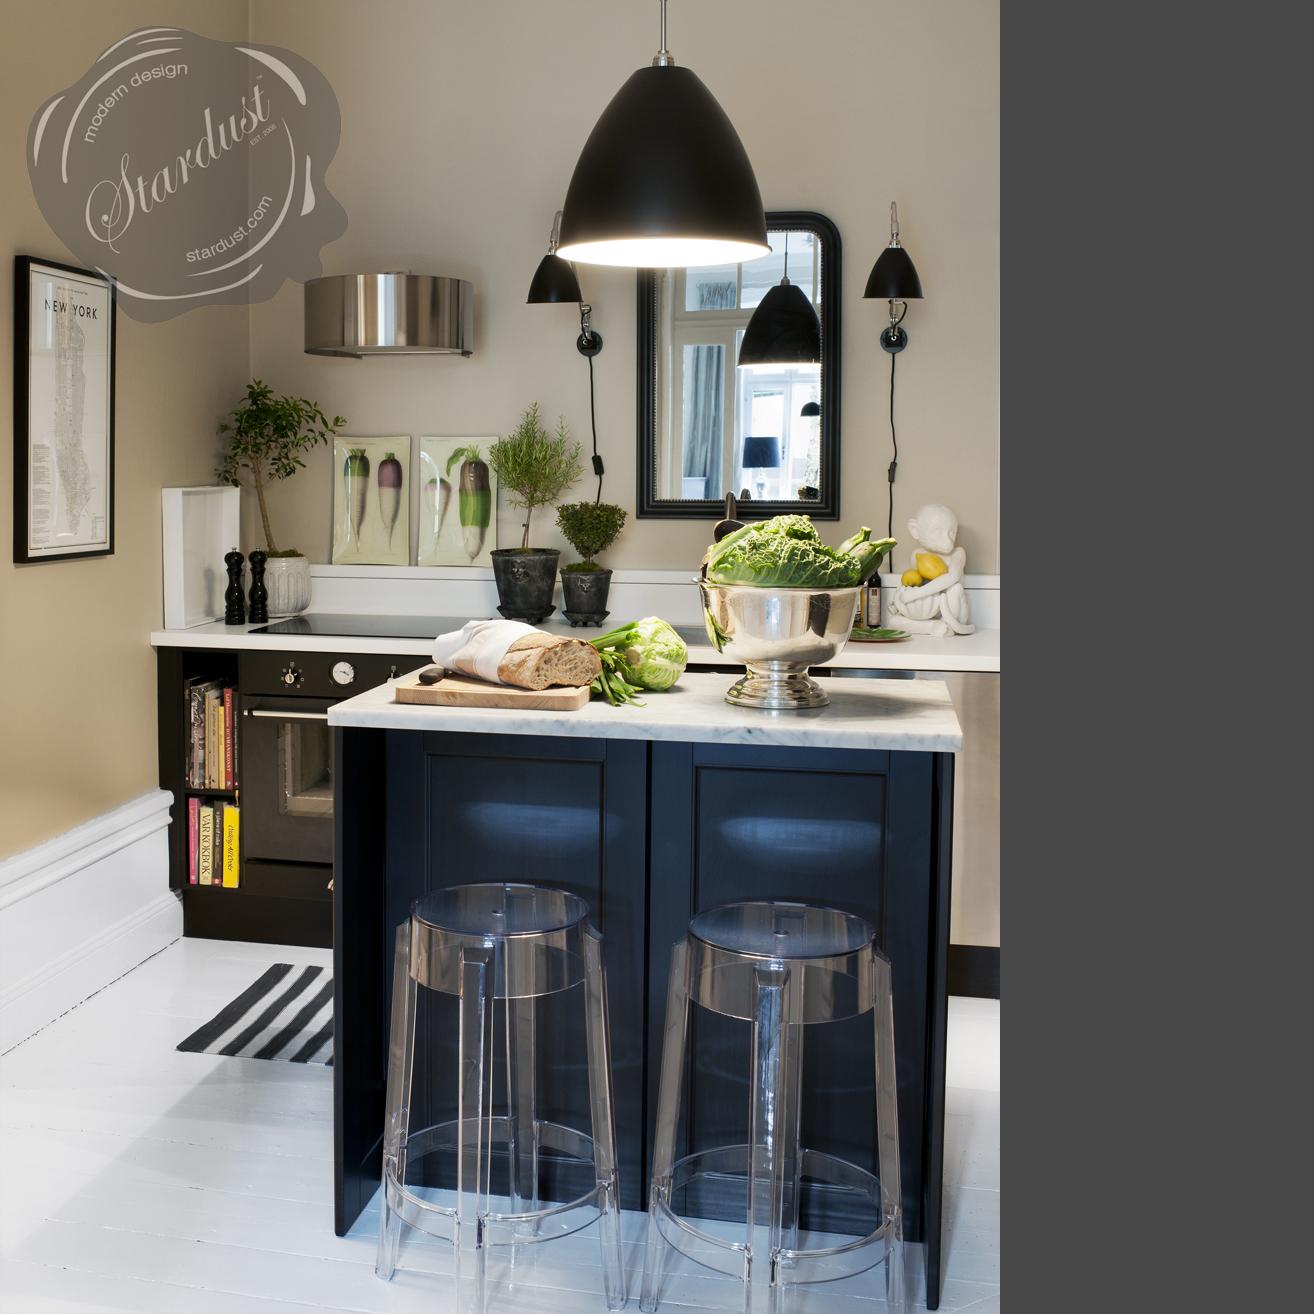 Modern Kitchen Bar Stools Milos Clear Acrylic Transparent Counter Stool Acrylyc